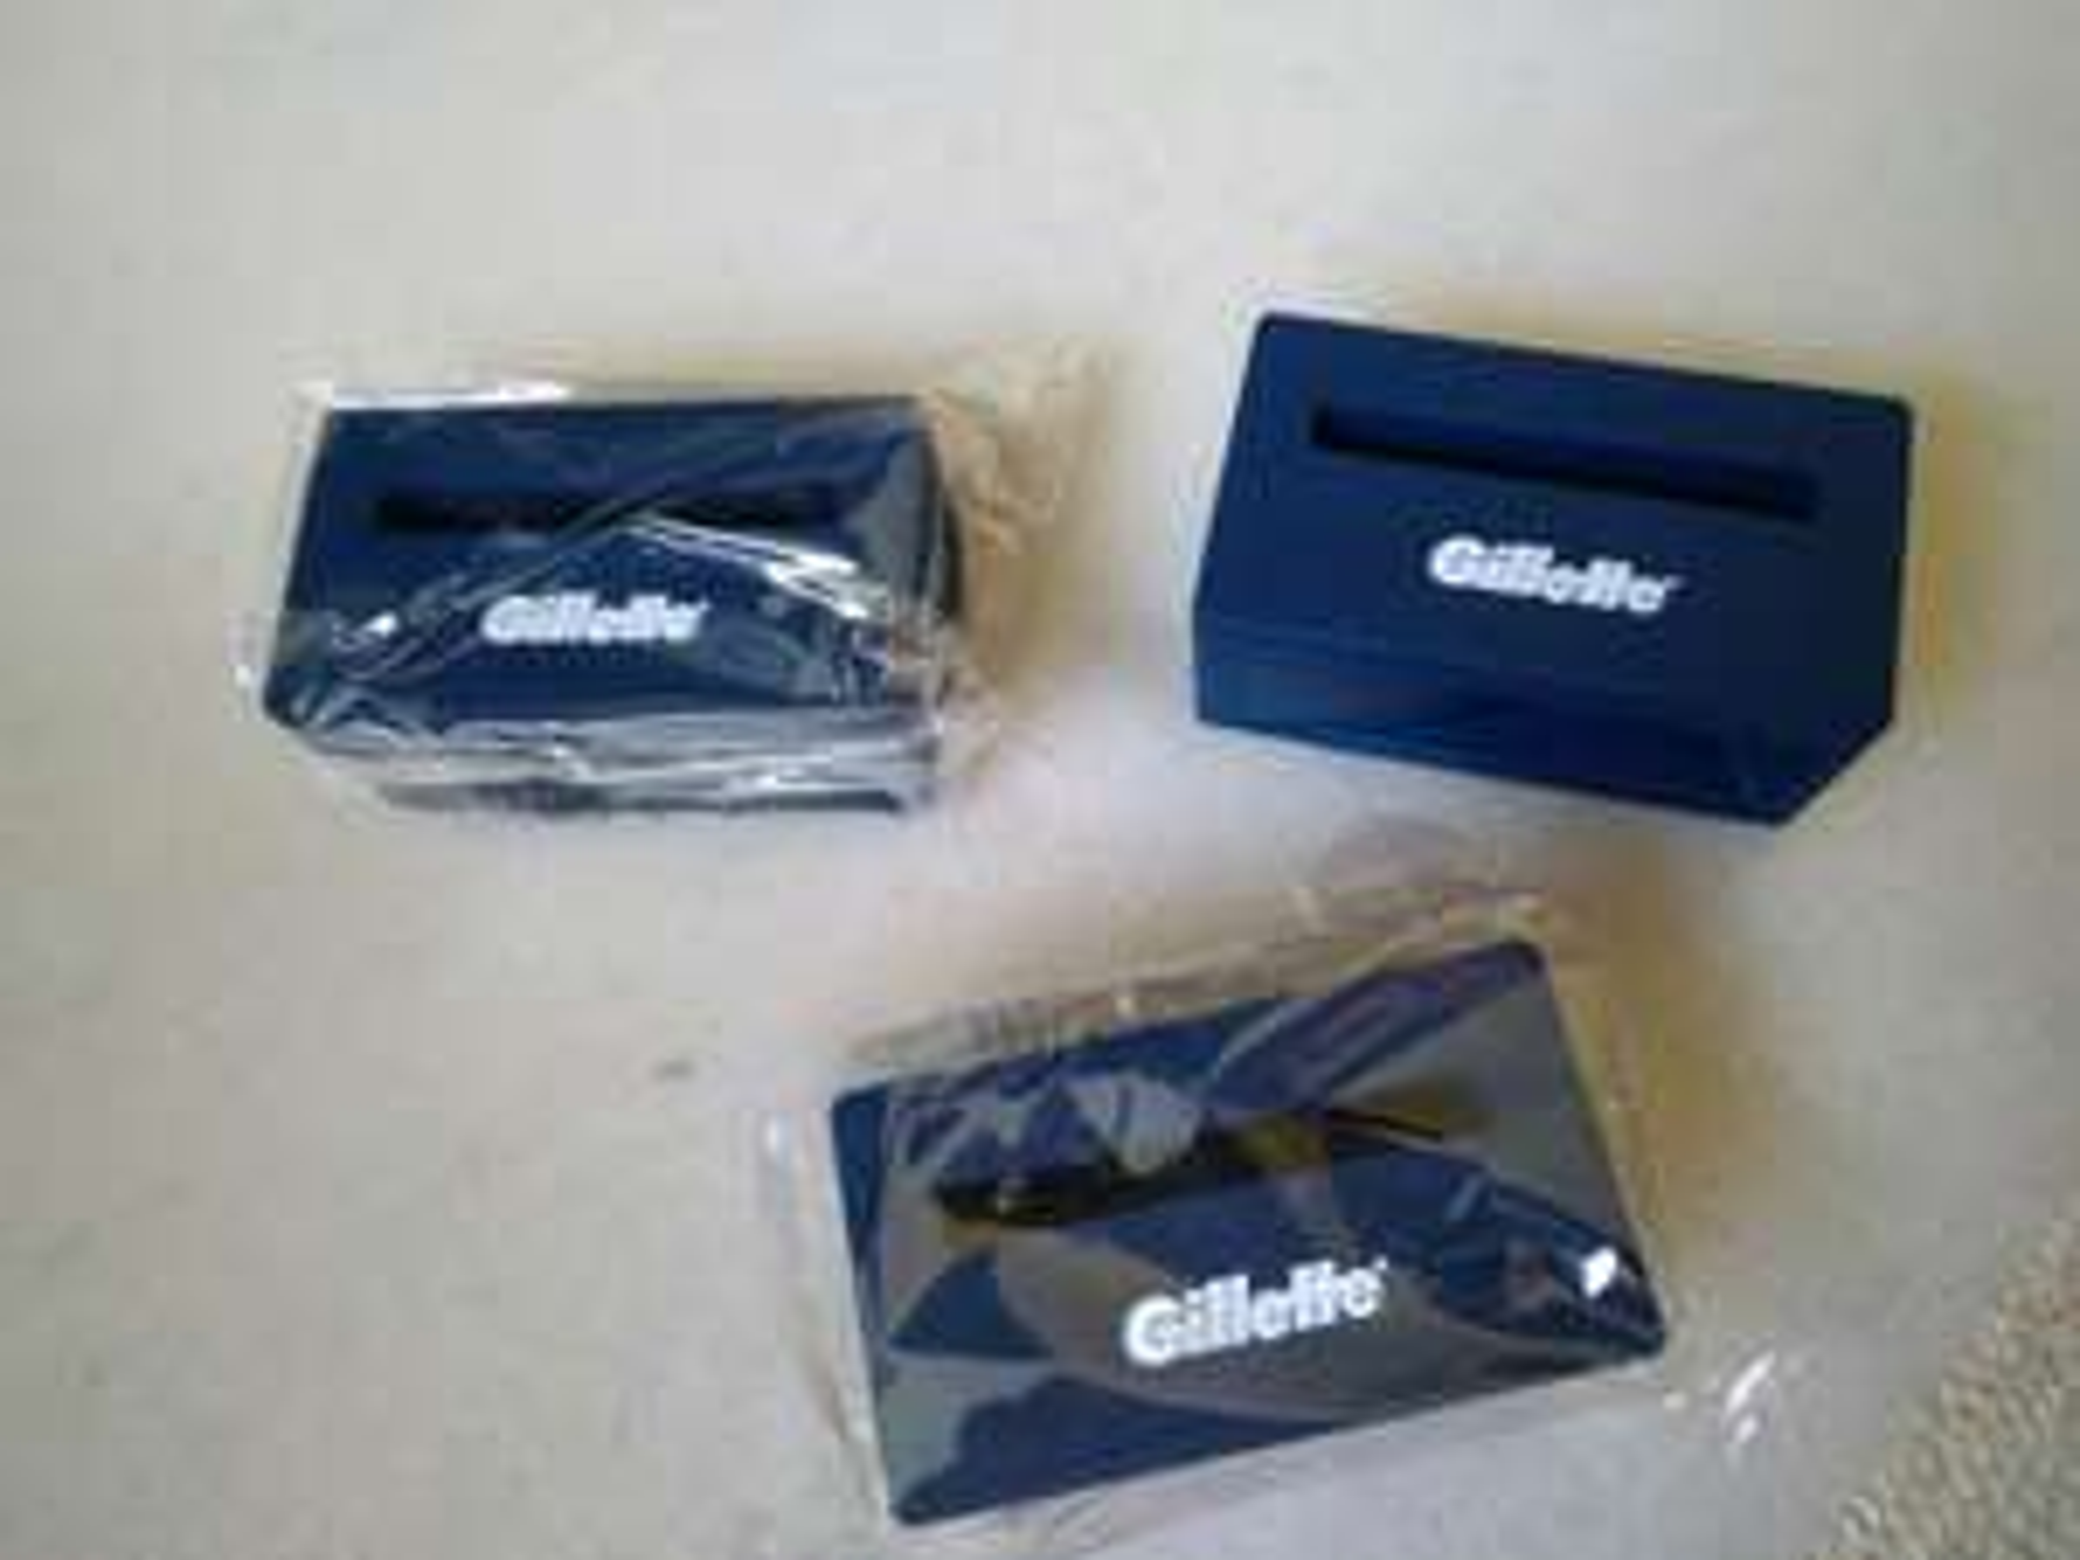 [Lokal Hamburg-Tonndorf] Silikon Audioverstärker / Halter für Smartphone von Gilette